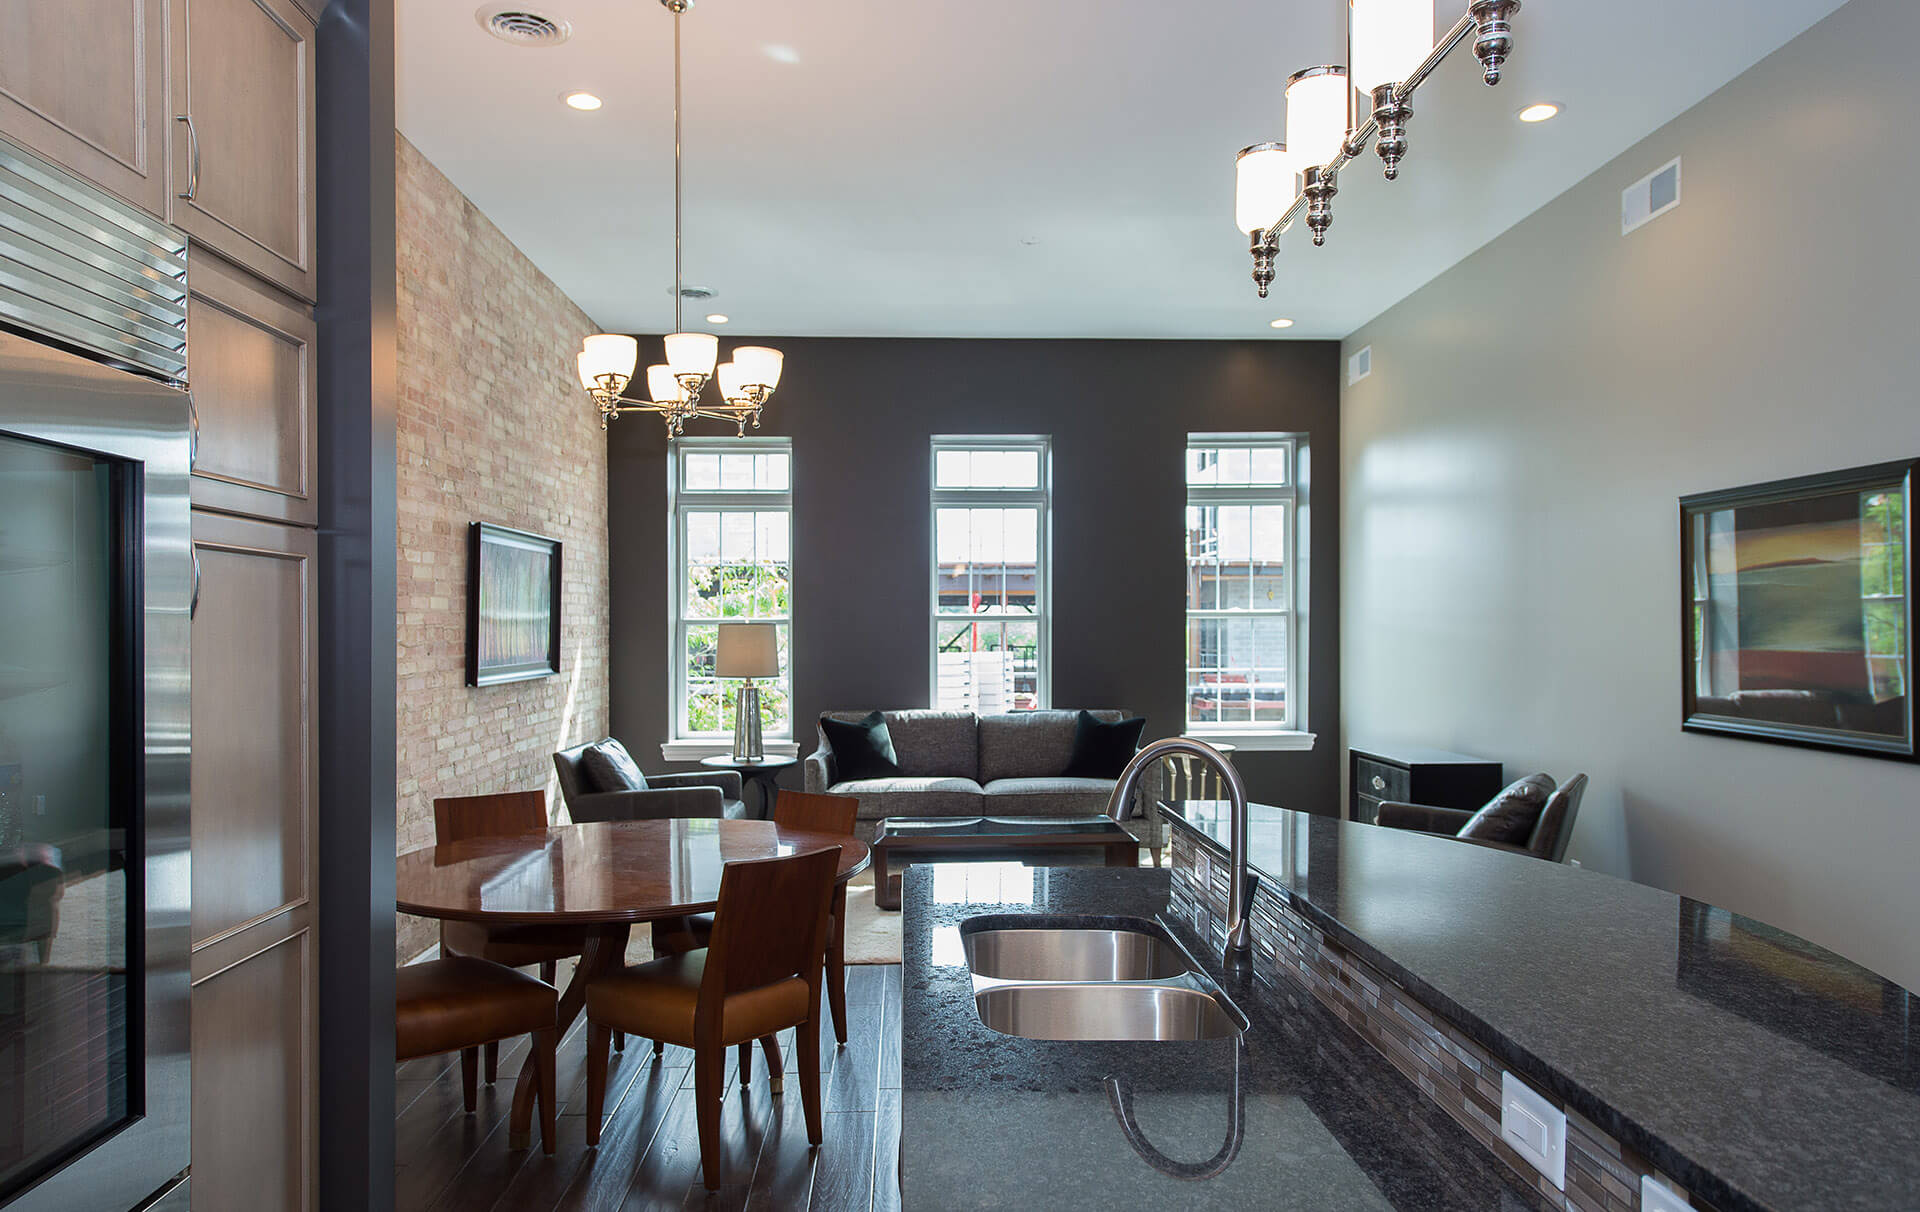 SSP_Midland_Apartment_071615-21